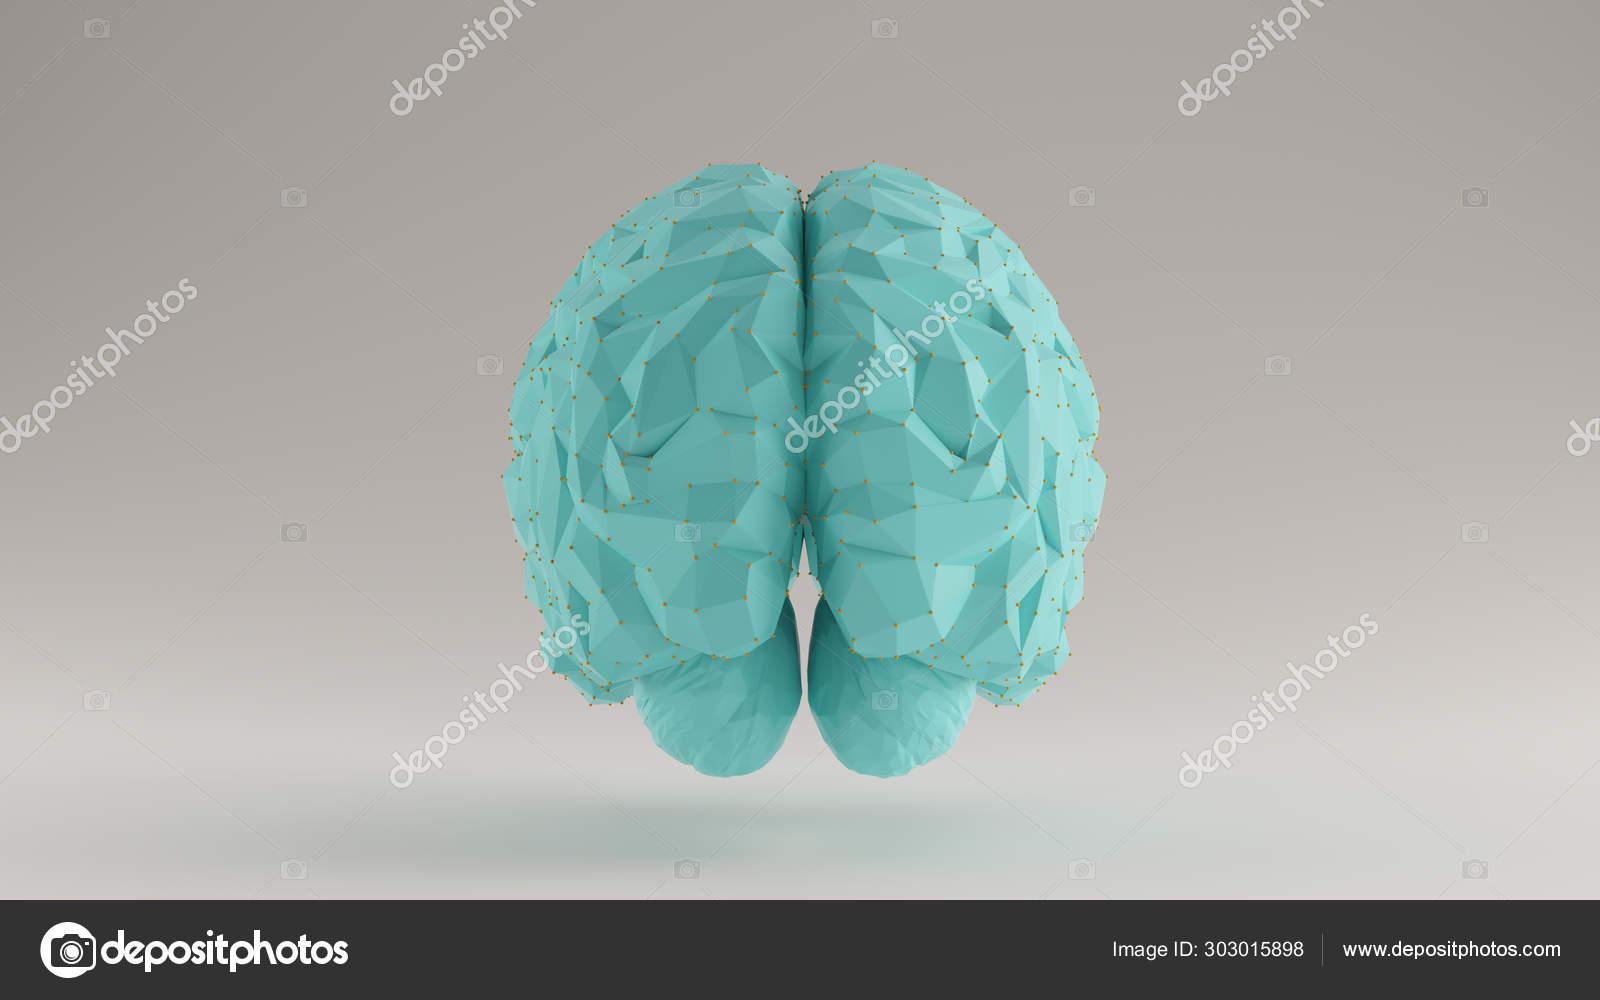 Brain Gulf Blue Turquoise Orange Futuristic Artificial